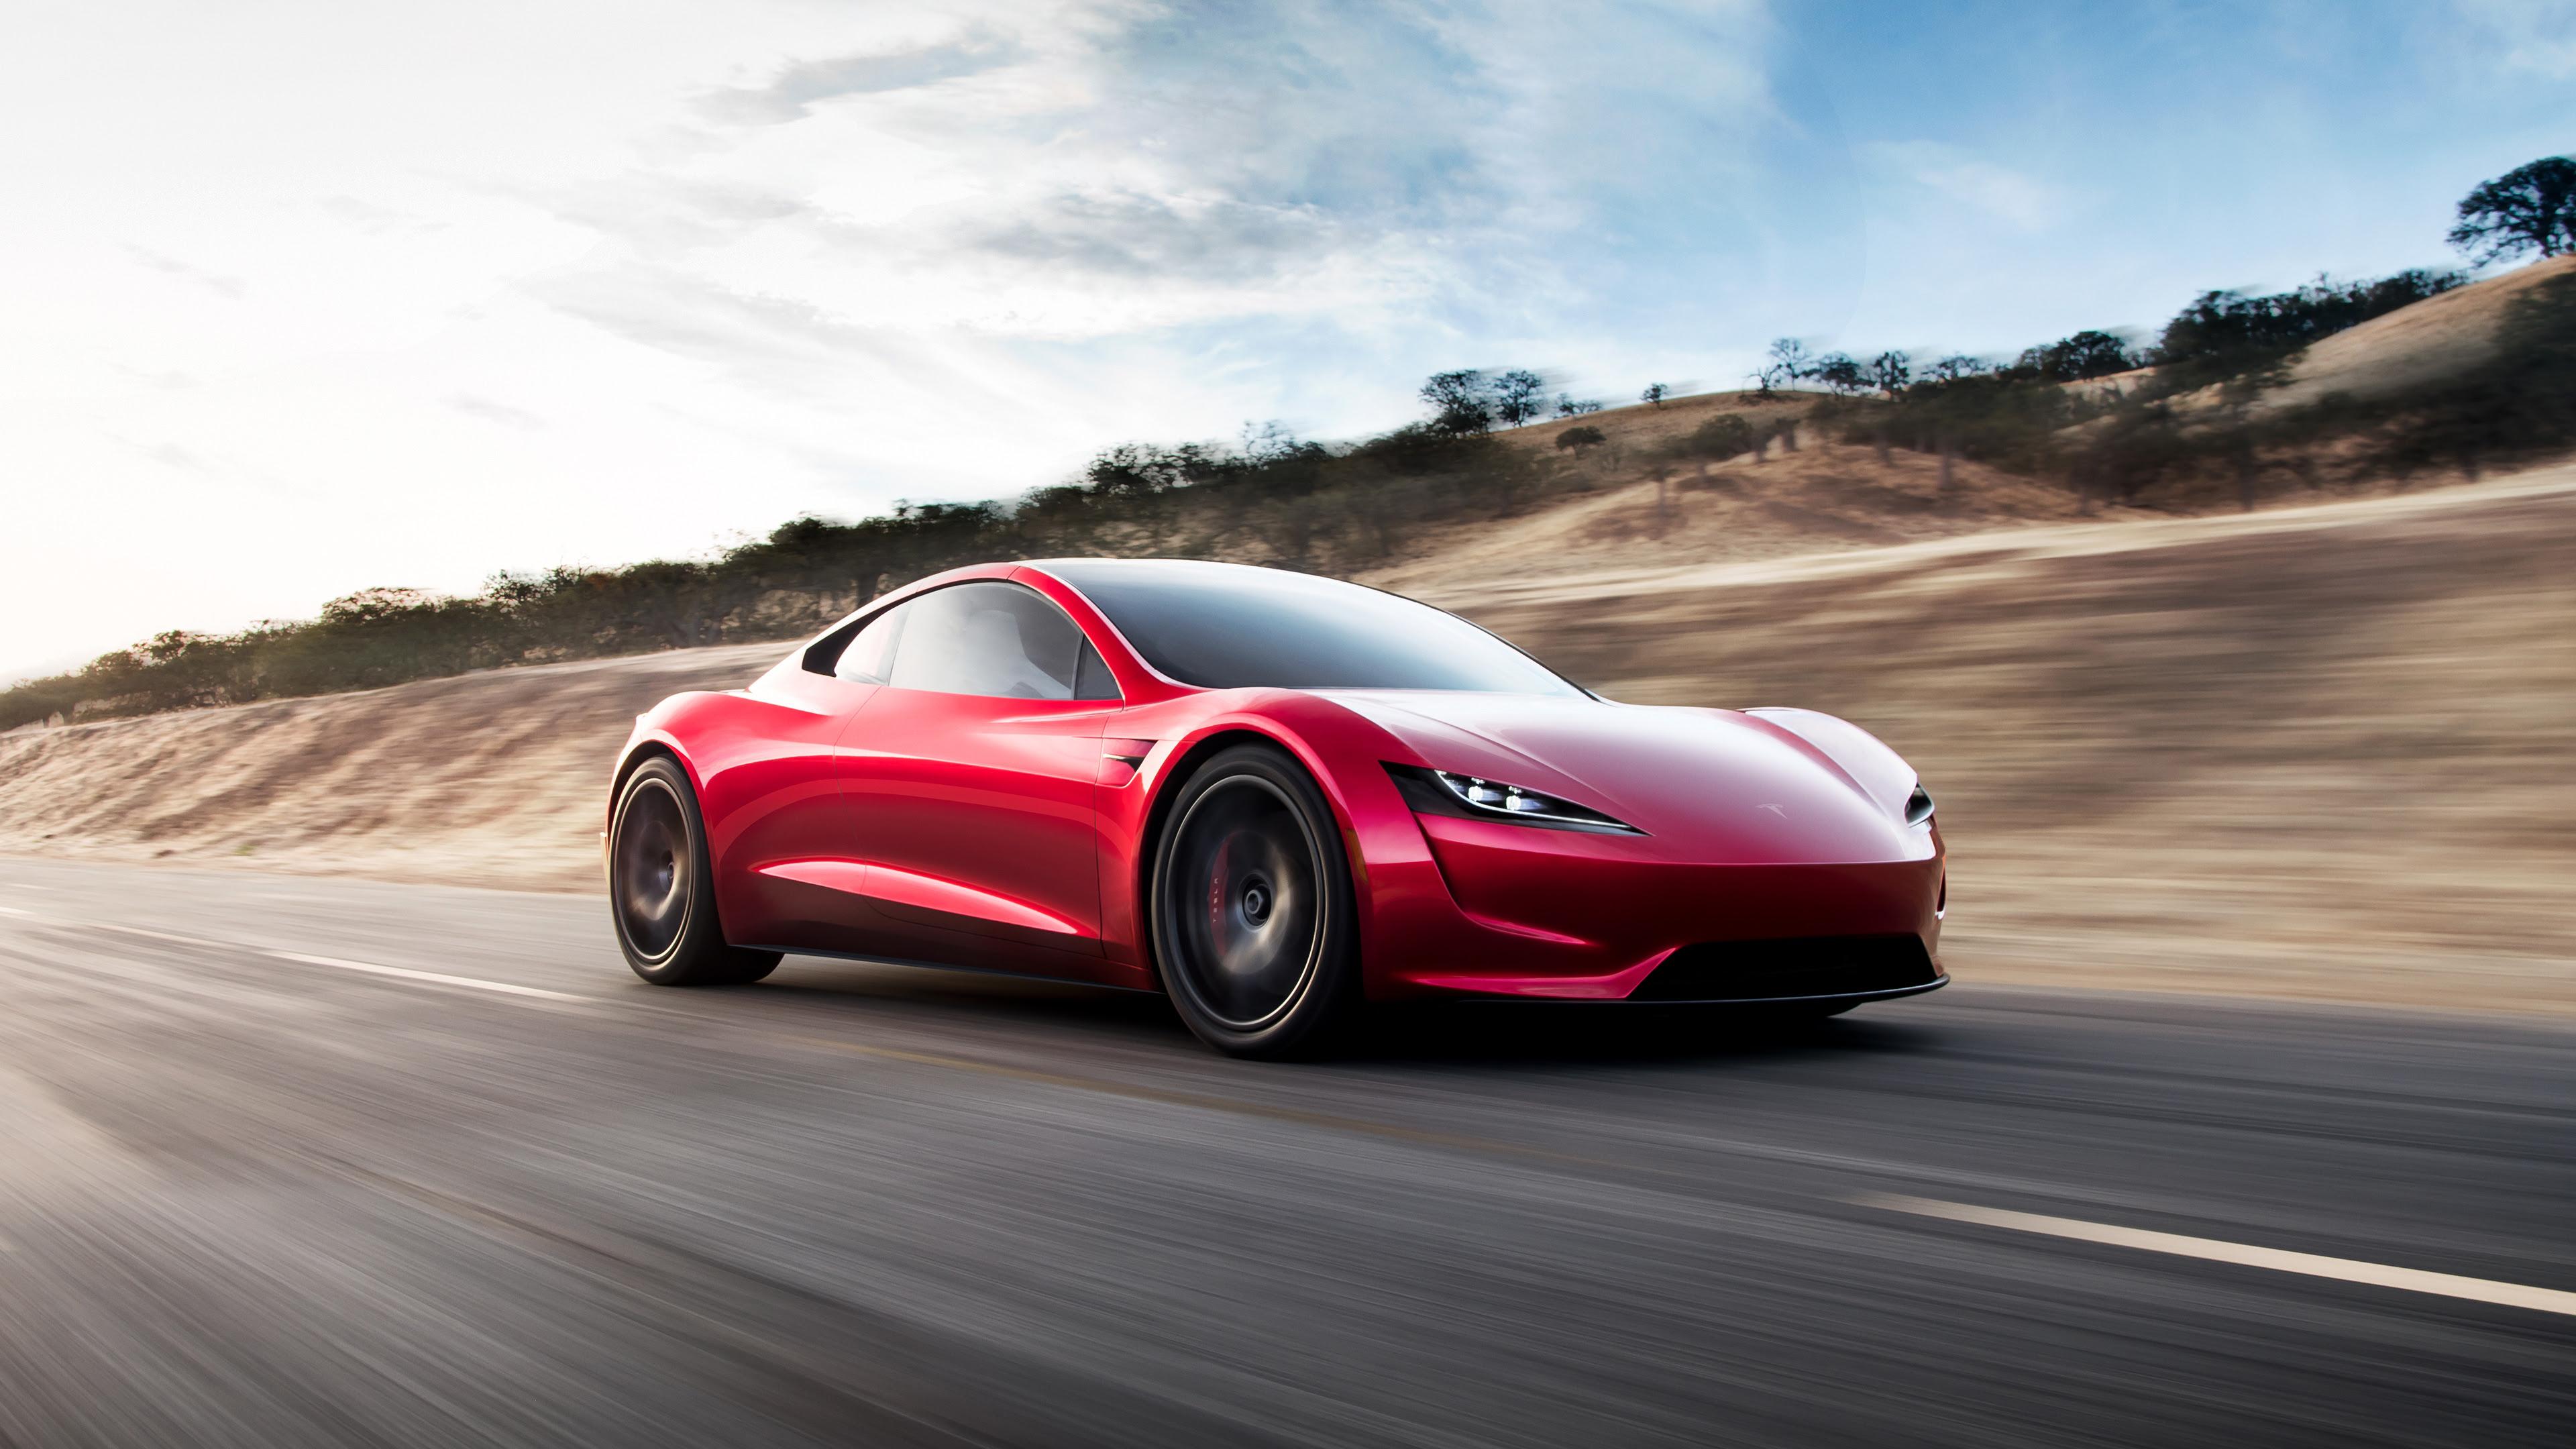 Tesla Roadster 4k, HD Cars, 4k Wallpapers, Images ...